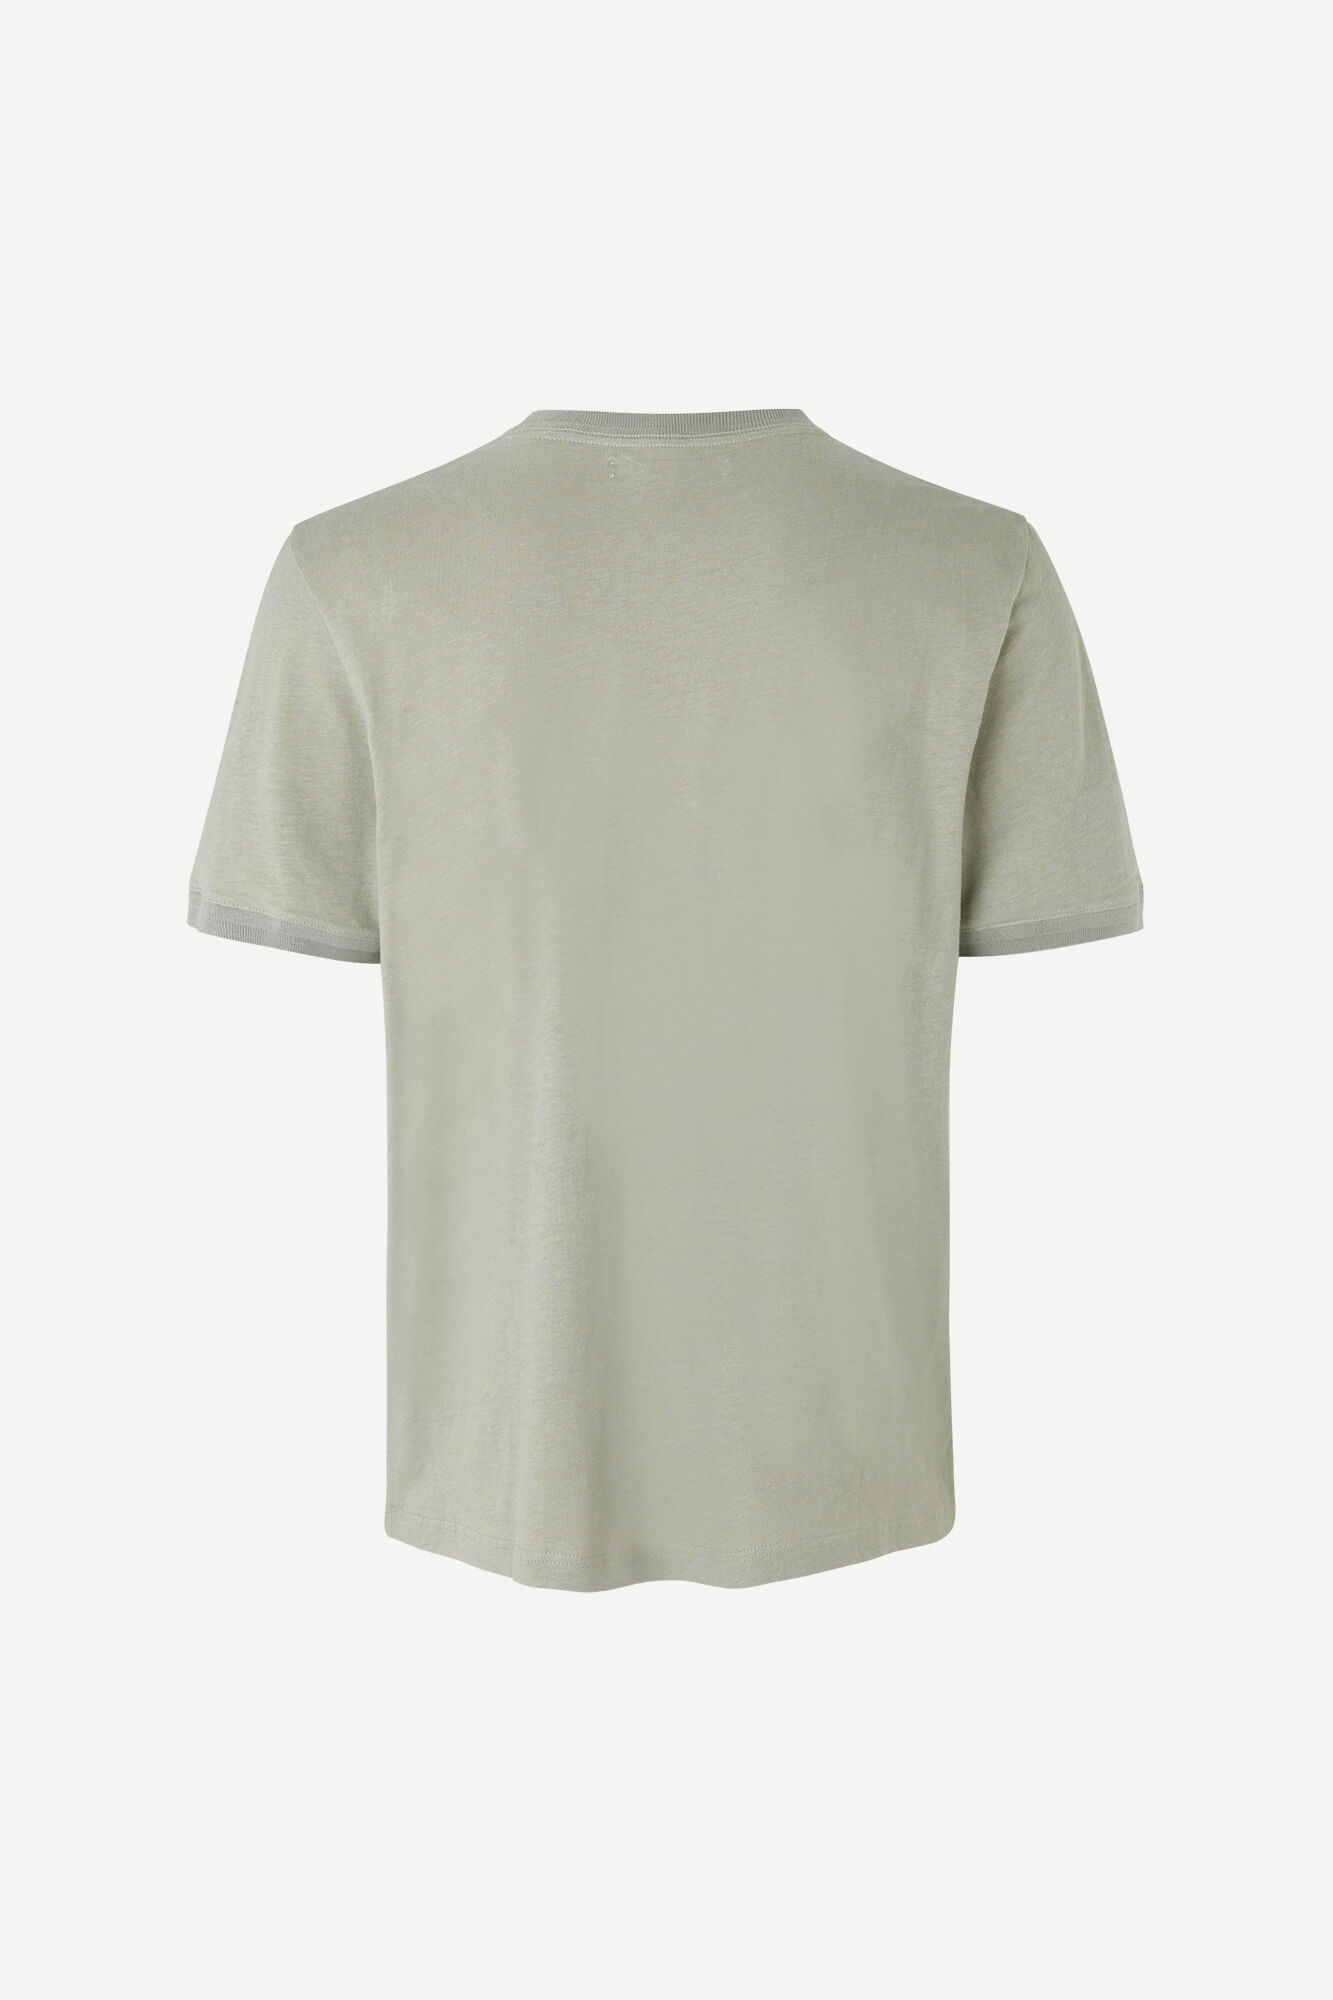 Stuart t-shirt 11711, SEAGRASS